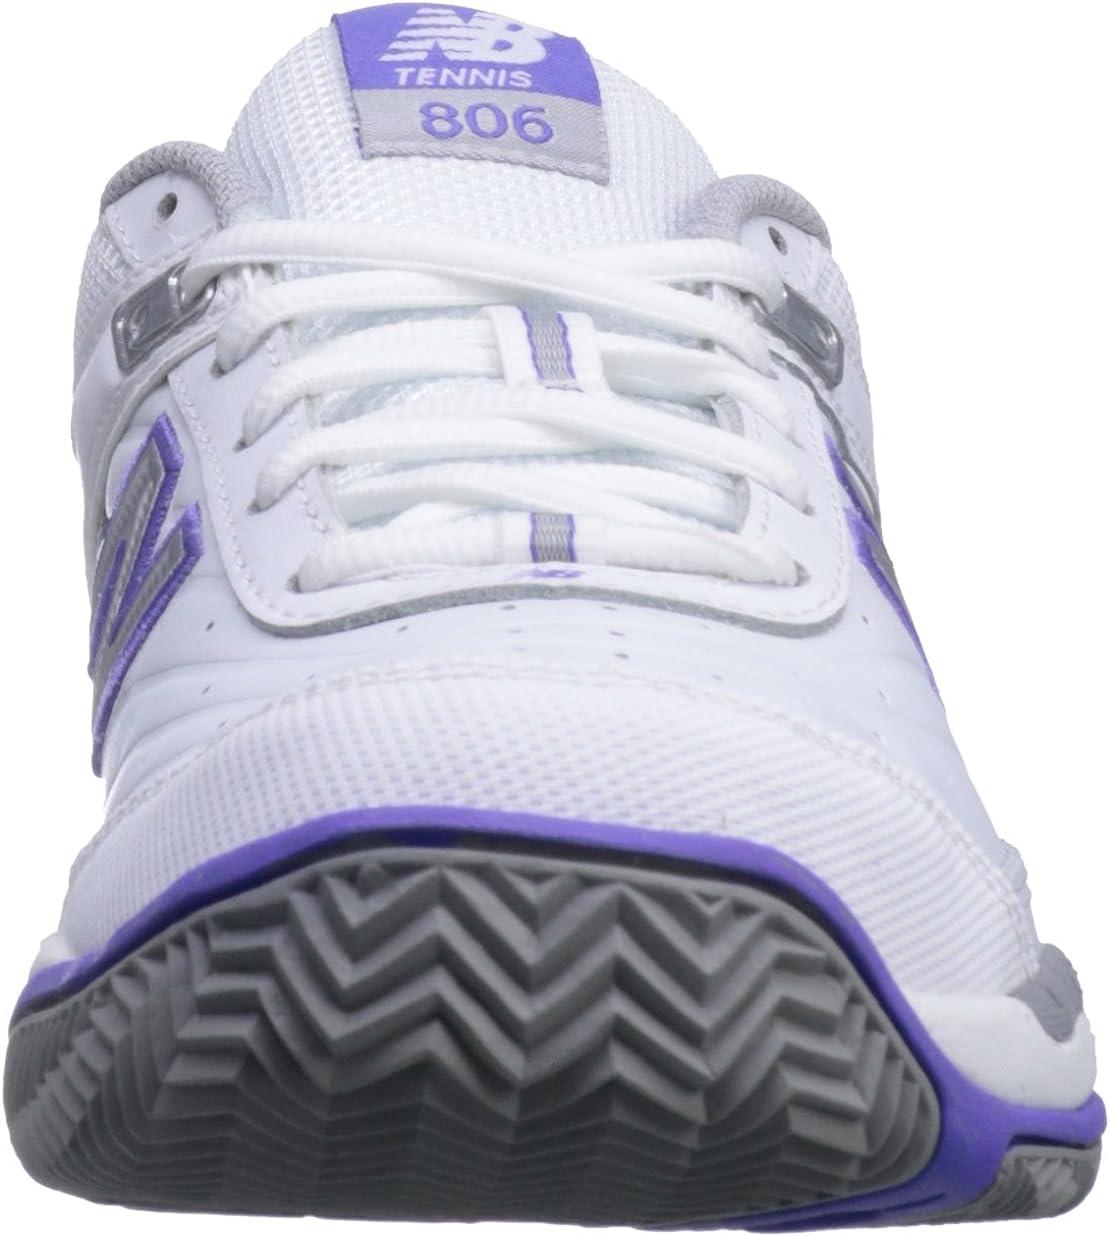 New Balance Women's 806 V1 Tennis Shoe